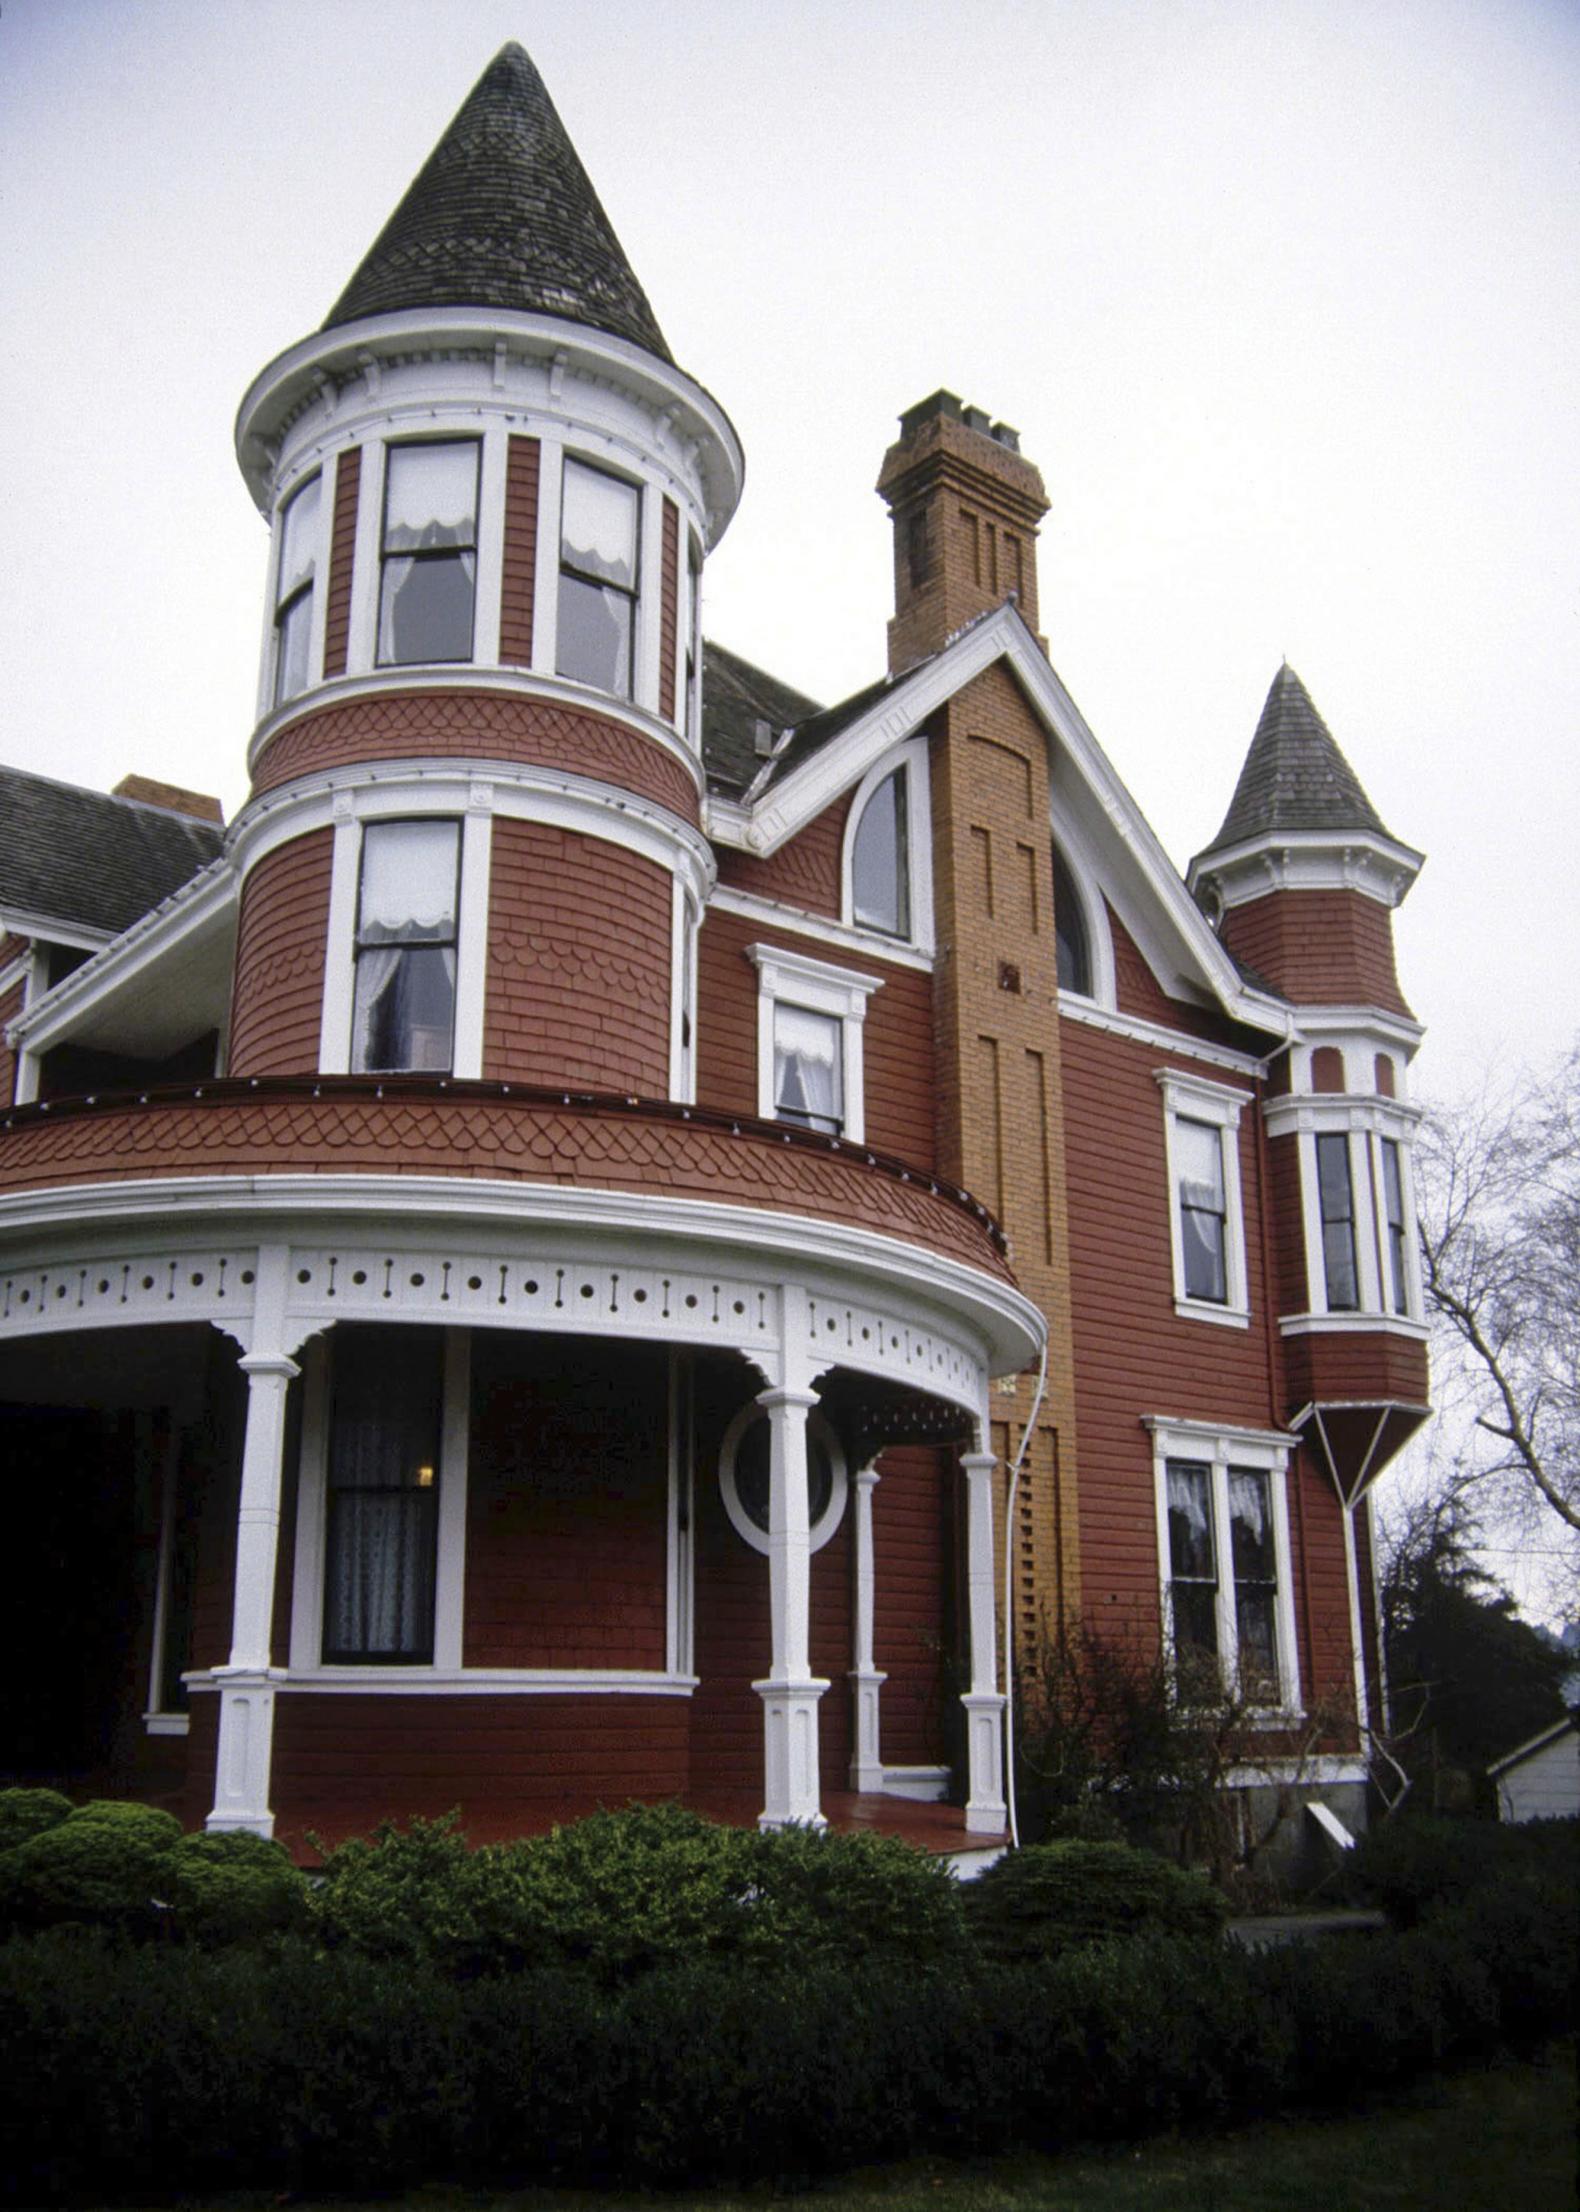 Df5411 esquemas de color casa exteriores con persianas negras - Df5411 Esquemas De Color Casa Exteriores Con Persianas Negras 13